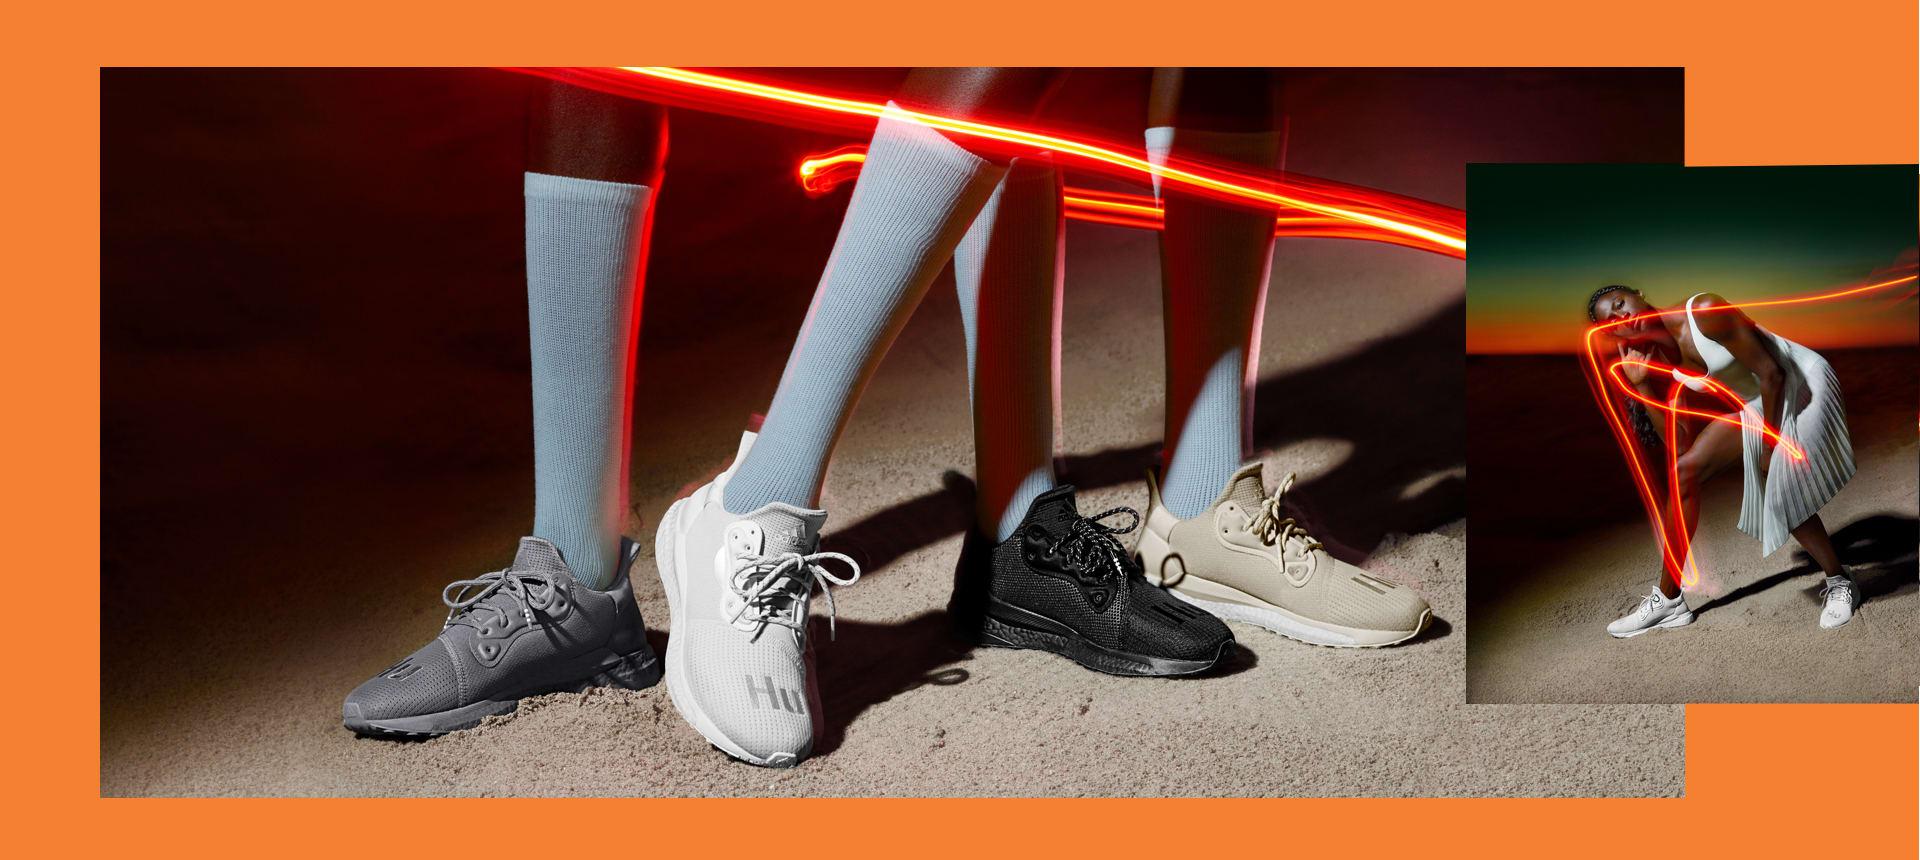 Adidas HoliFr Collection Hu OriginalsPharrell Williams 0wXNn8POk